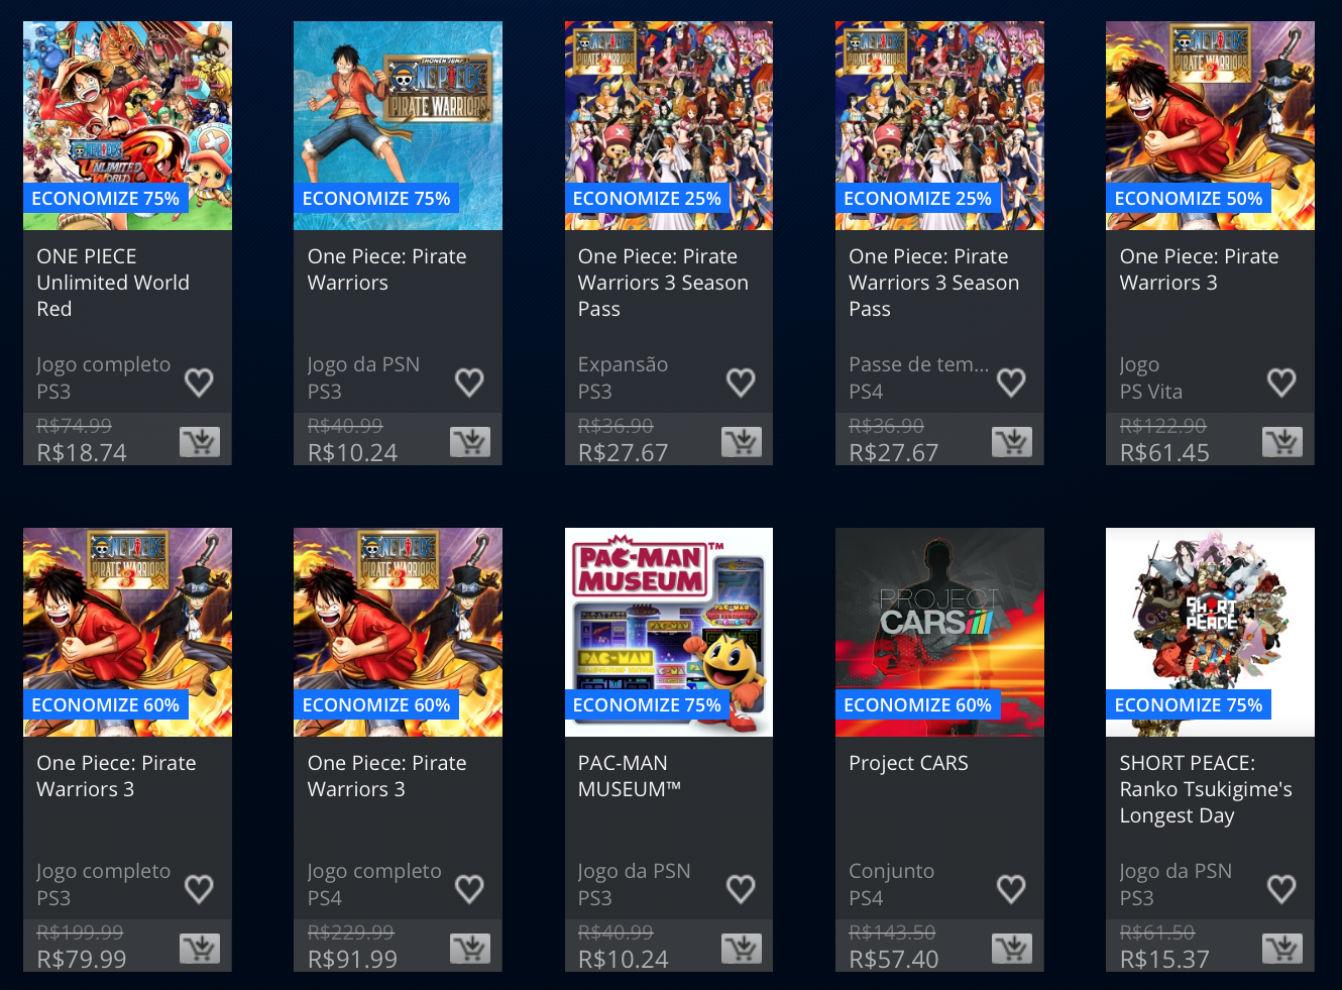 http://www.meups4.com.br/wp-content/uploads/2016/02/Bandai-Namco-Sale_3.jpg